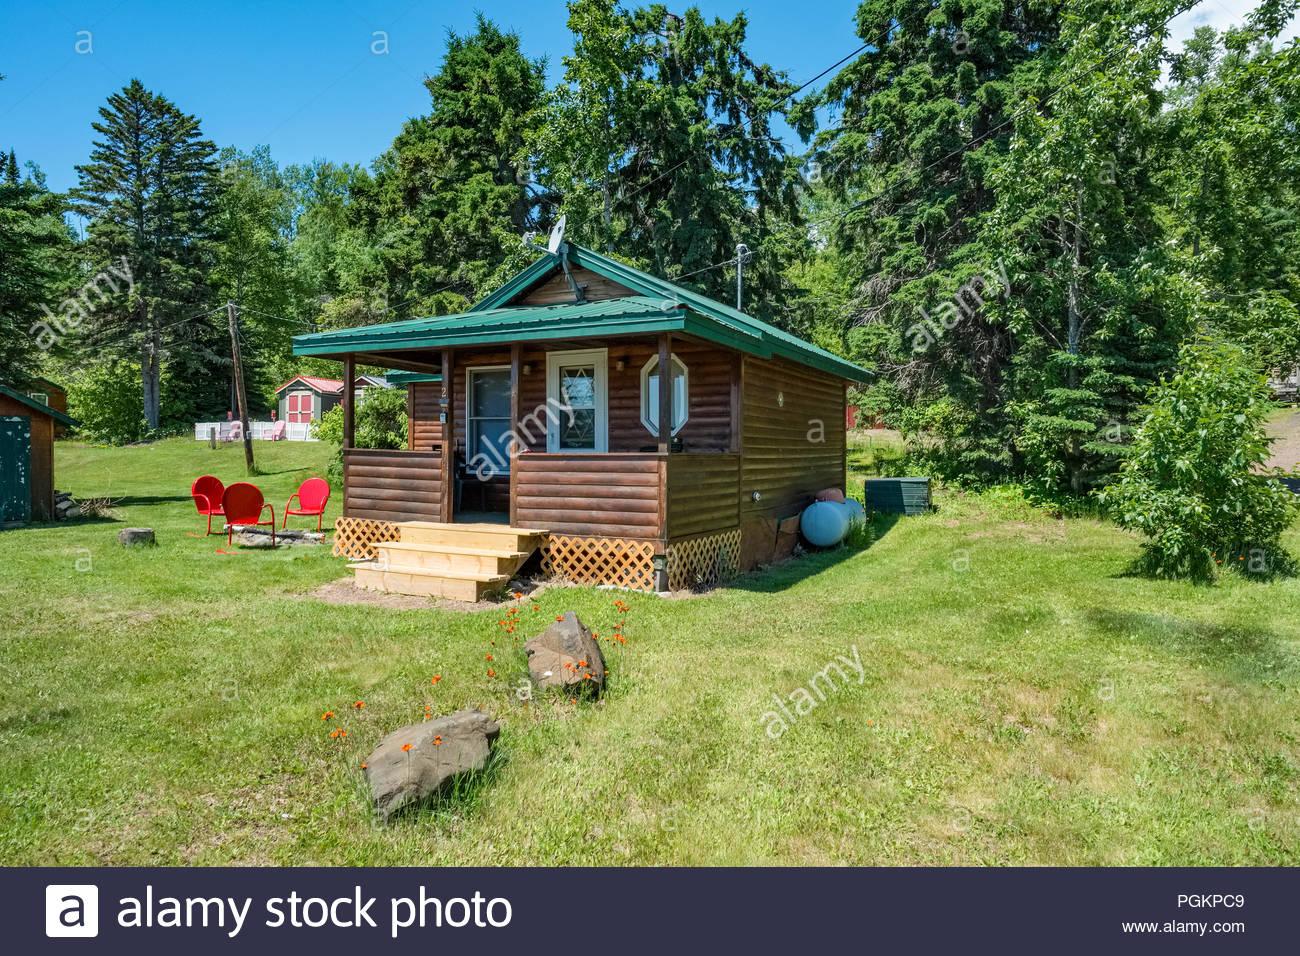 Cabins located a short walk from Lake Superior, near Grand Marais, Minnesota, USA. Stock Photo